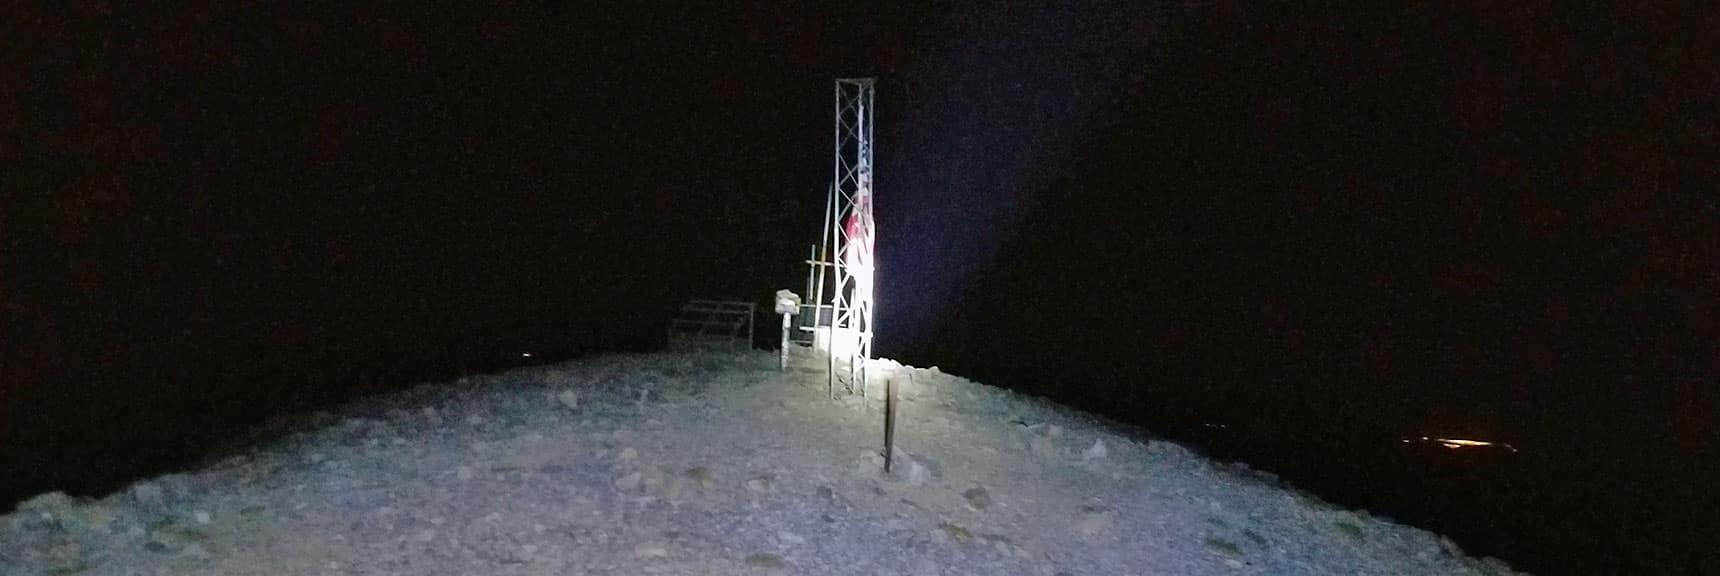 Charleston Peak Summit at 12:30am | Six Peak Circuit Adventure in the Spring Mountains, Nevada